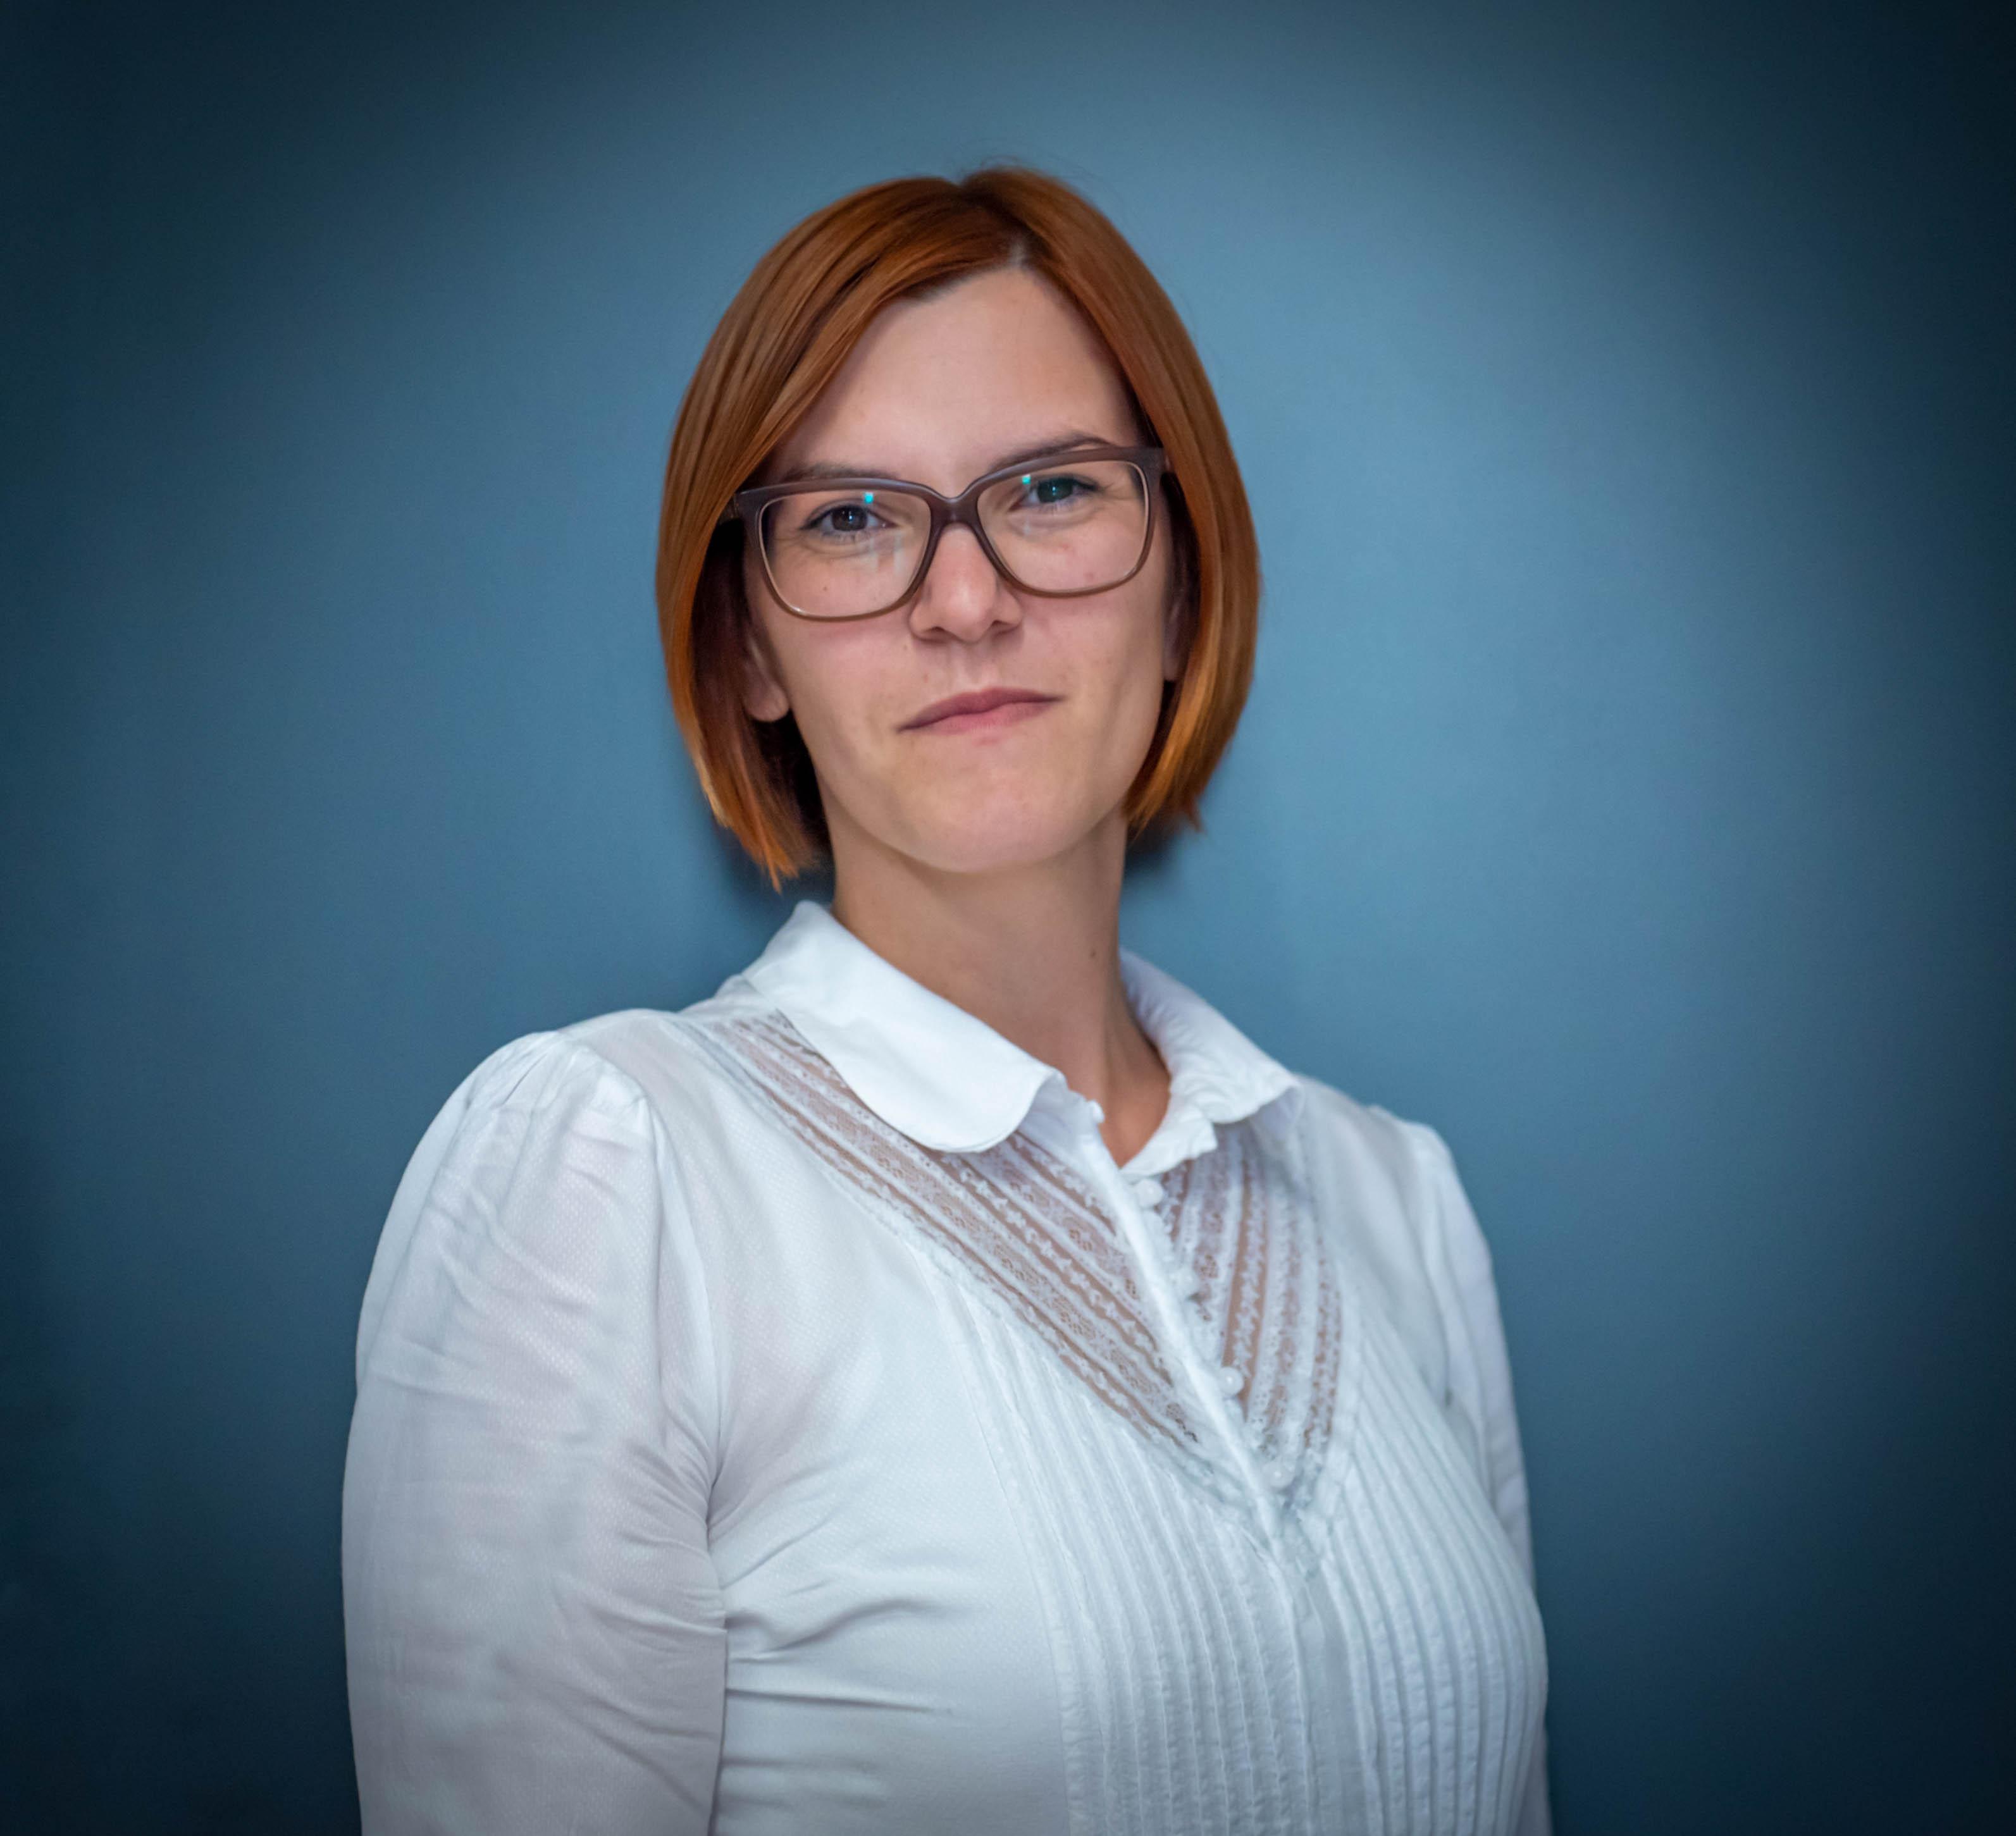 Katja Belec